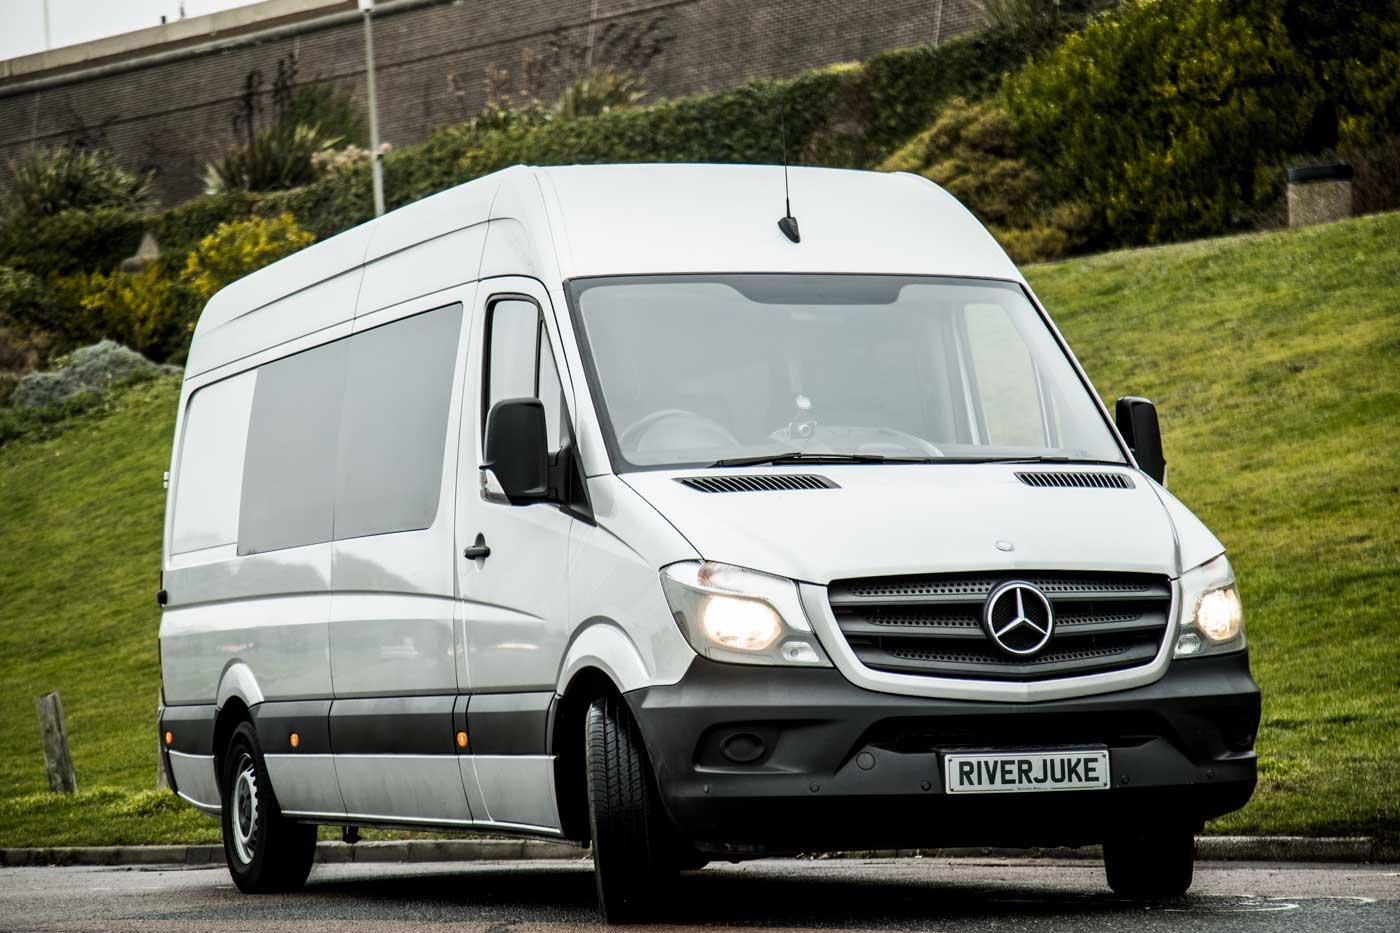 Splitter Van hire from Riverjuke